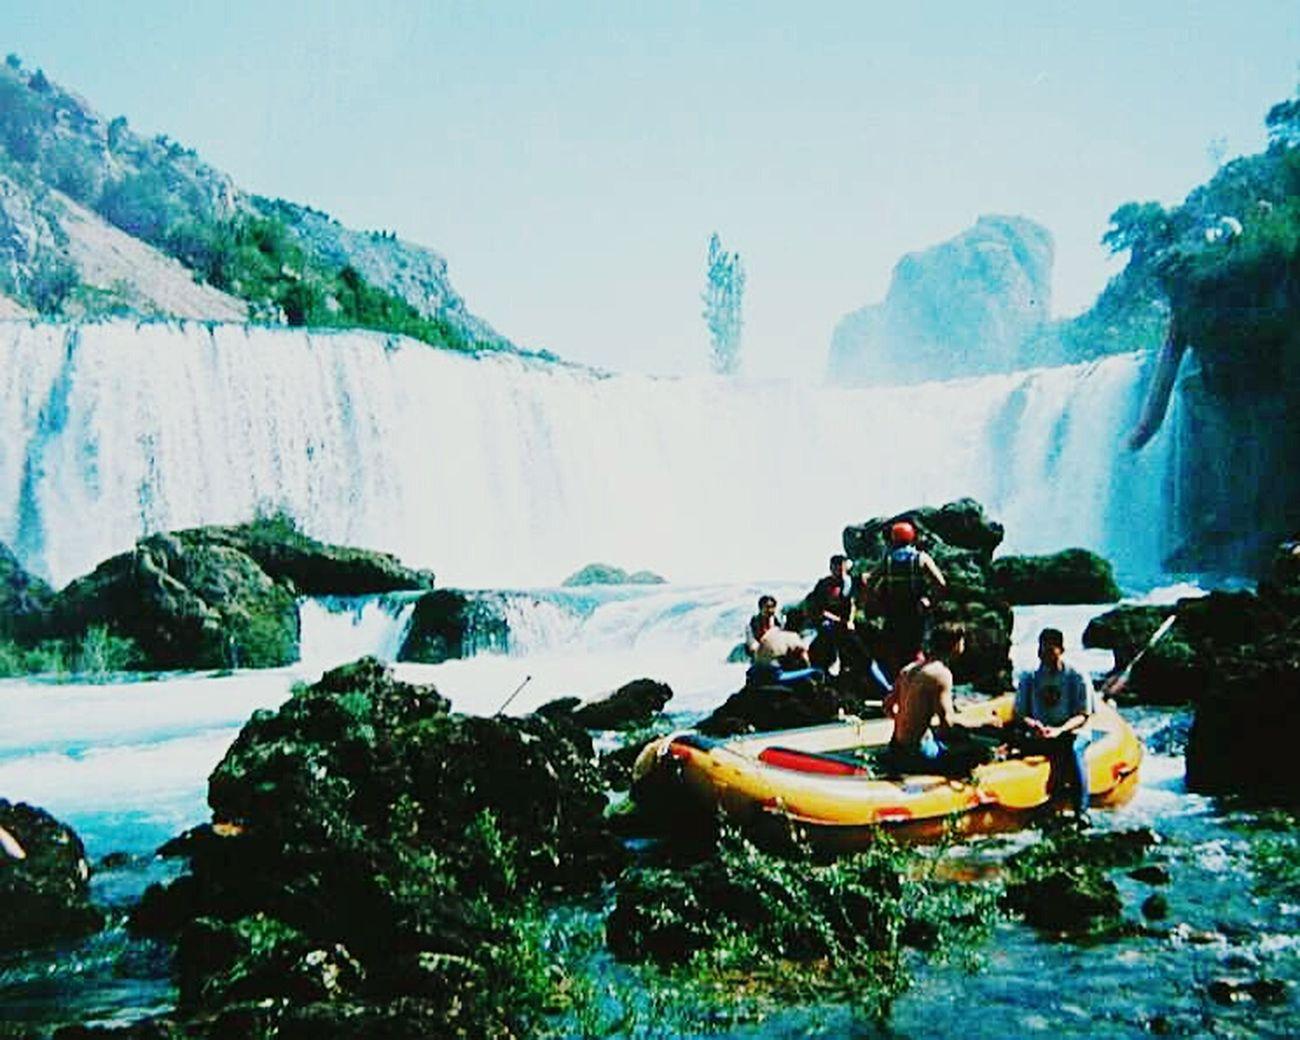 River Zrmanja Rafting Croatia Zrmanja Adventure